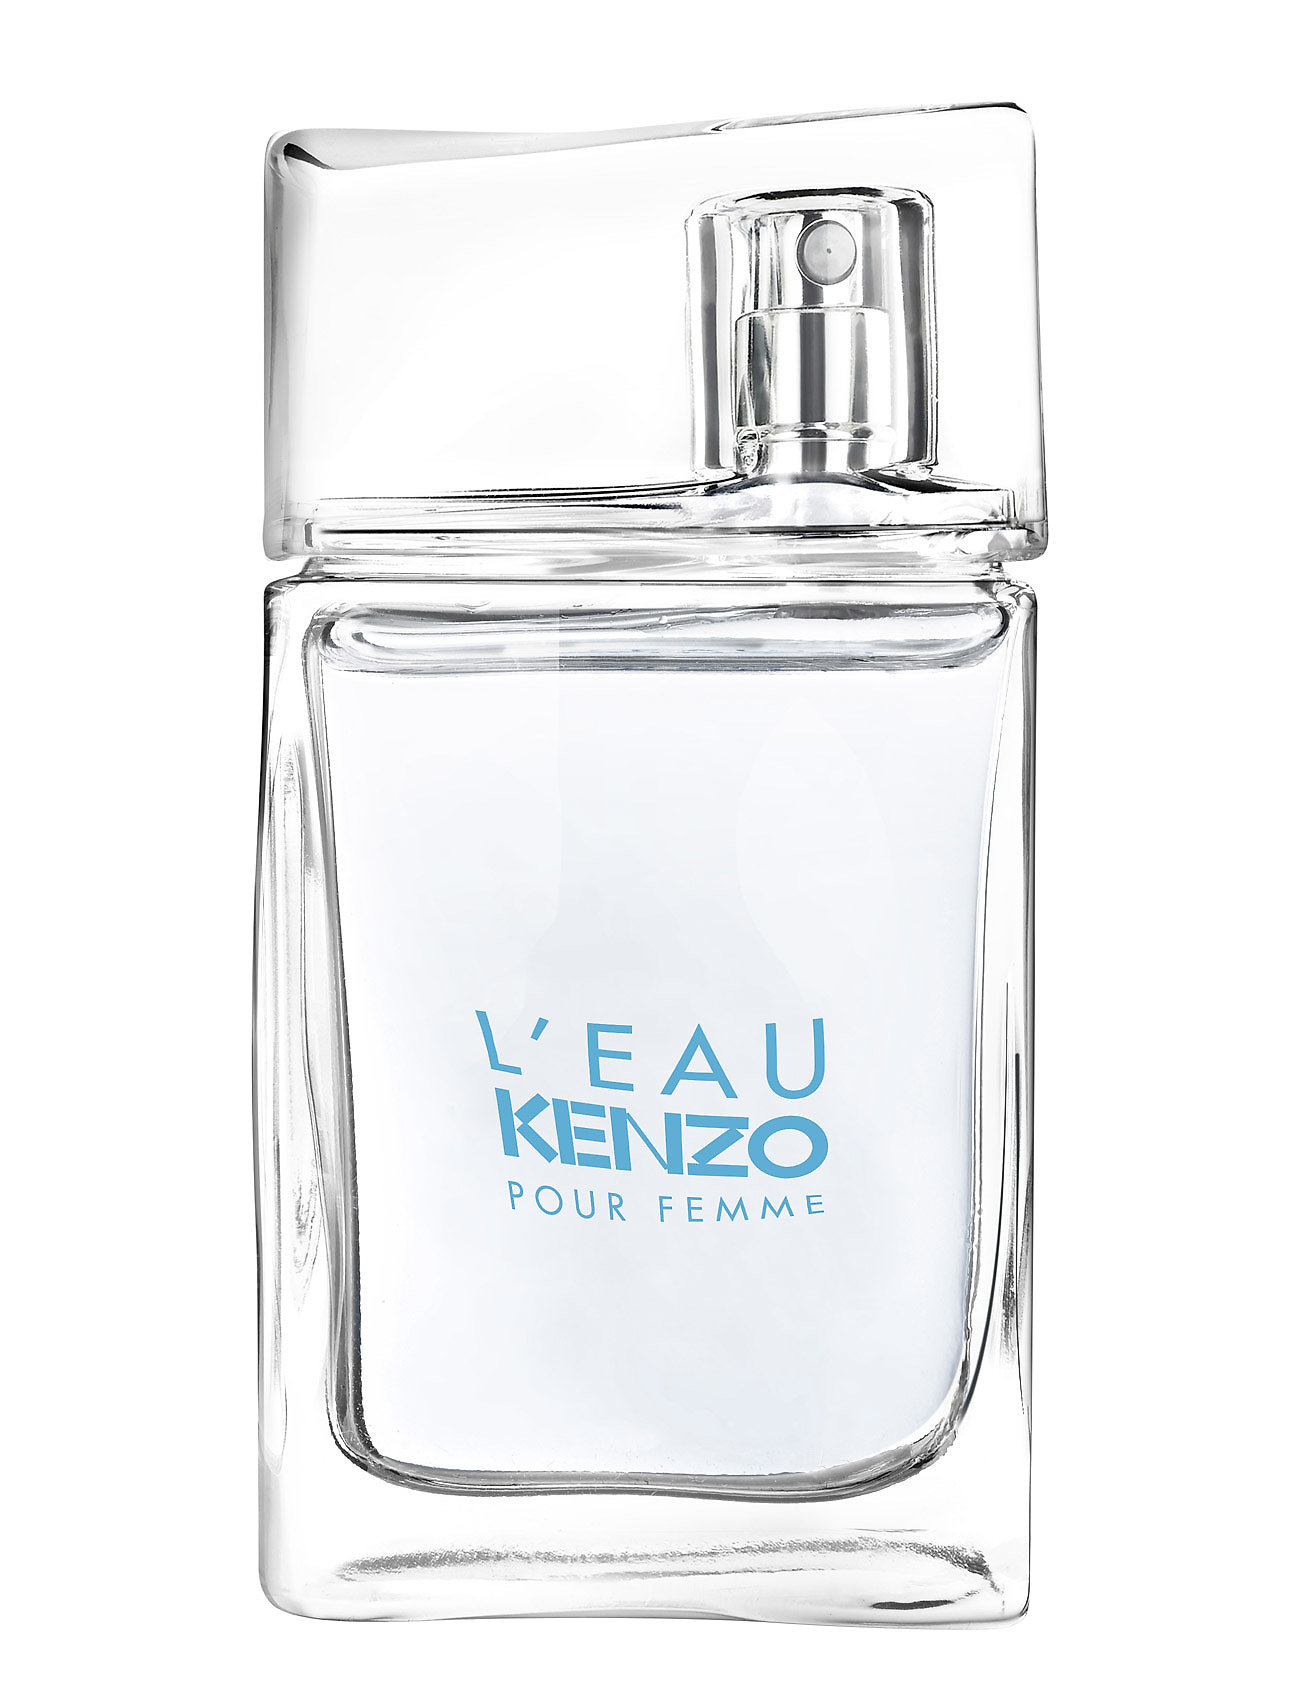 kenzo fragrance – Kenzo leau kenzo pour femme eau de fra boozt.com dk